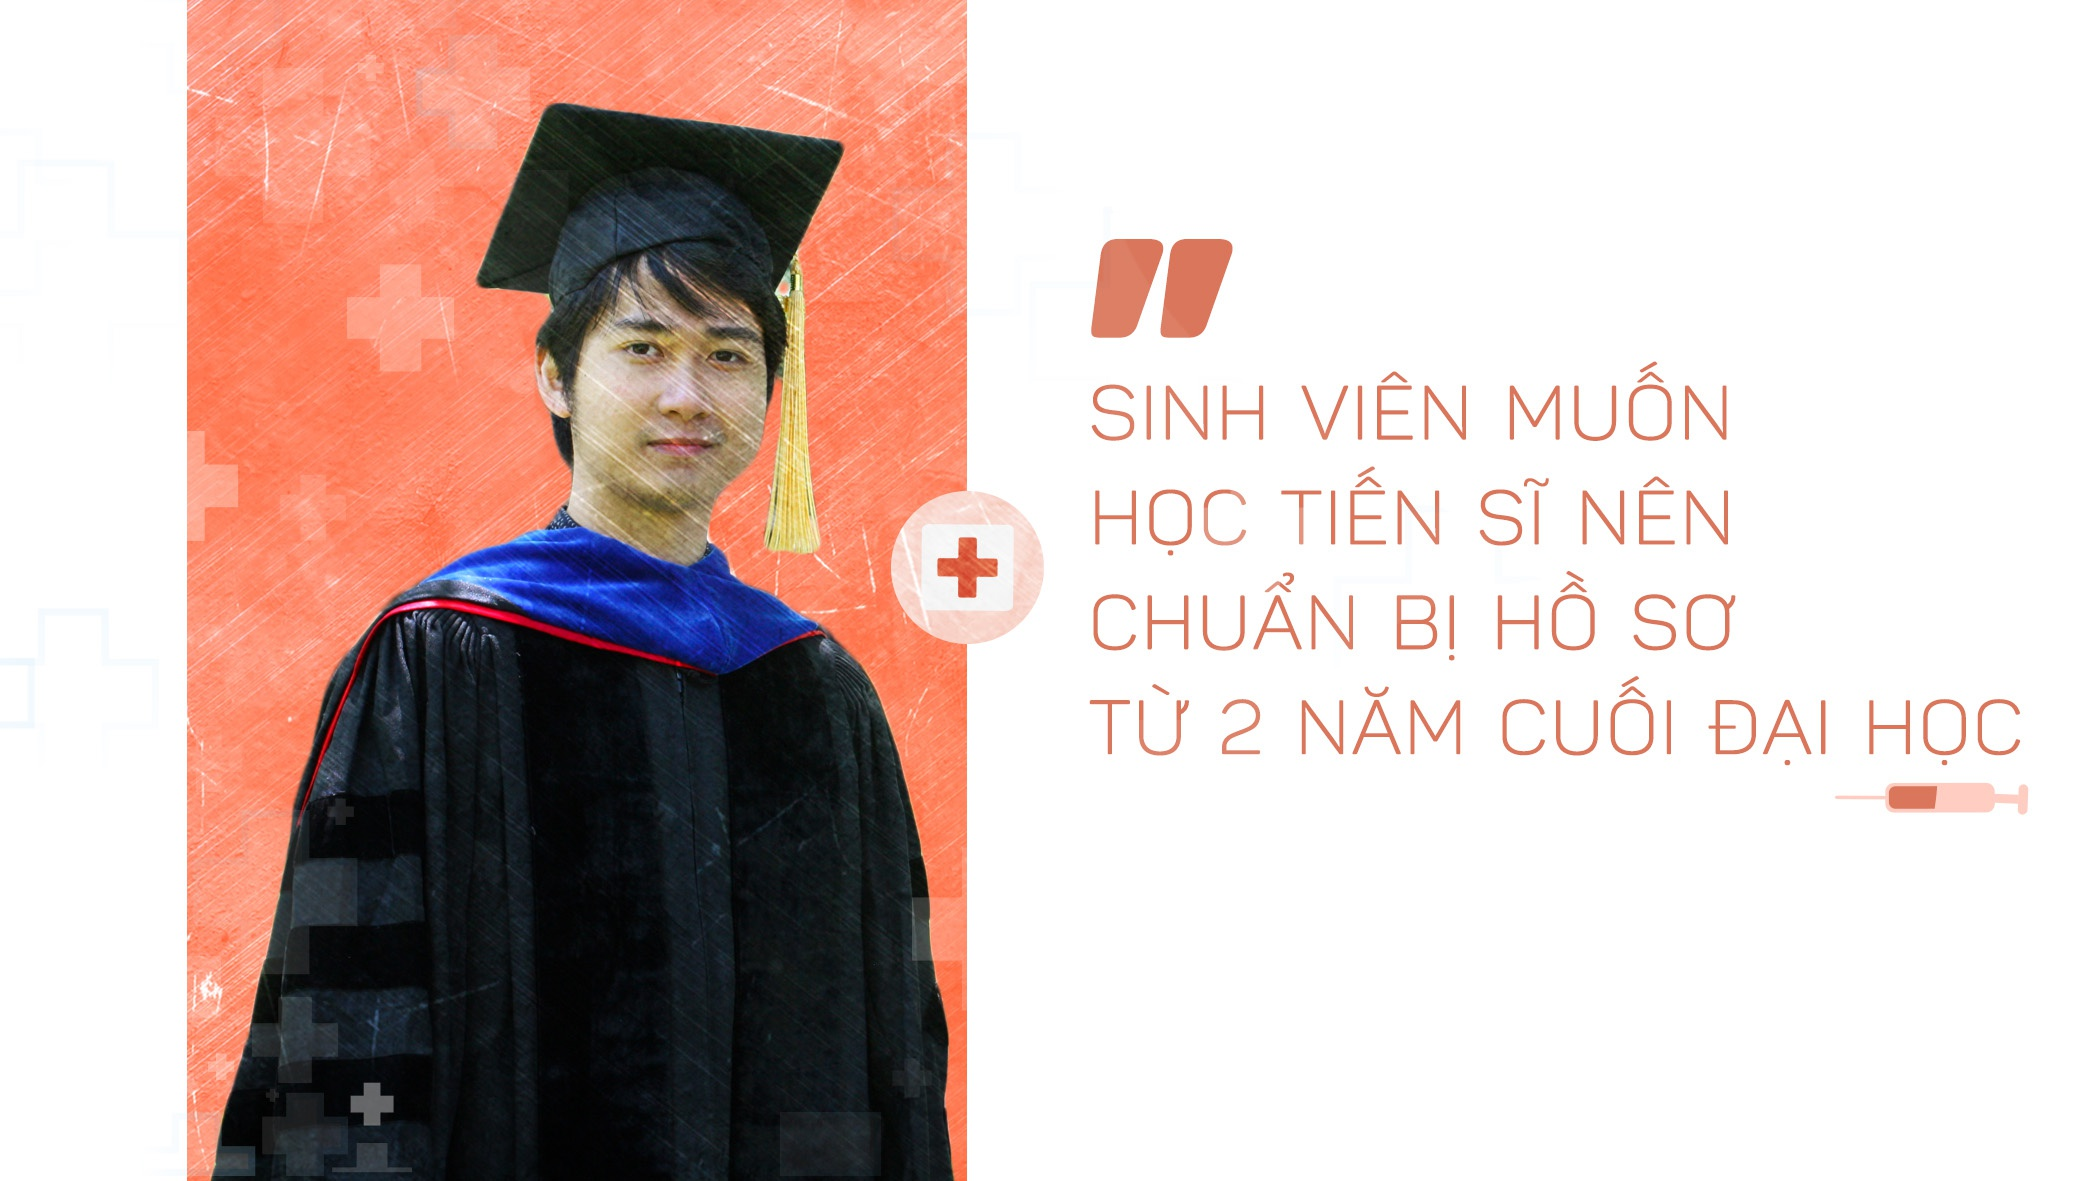 Tien si Viet nghien cuu thuoc chong ung thu, HIV tren dat My hinh anh 6